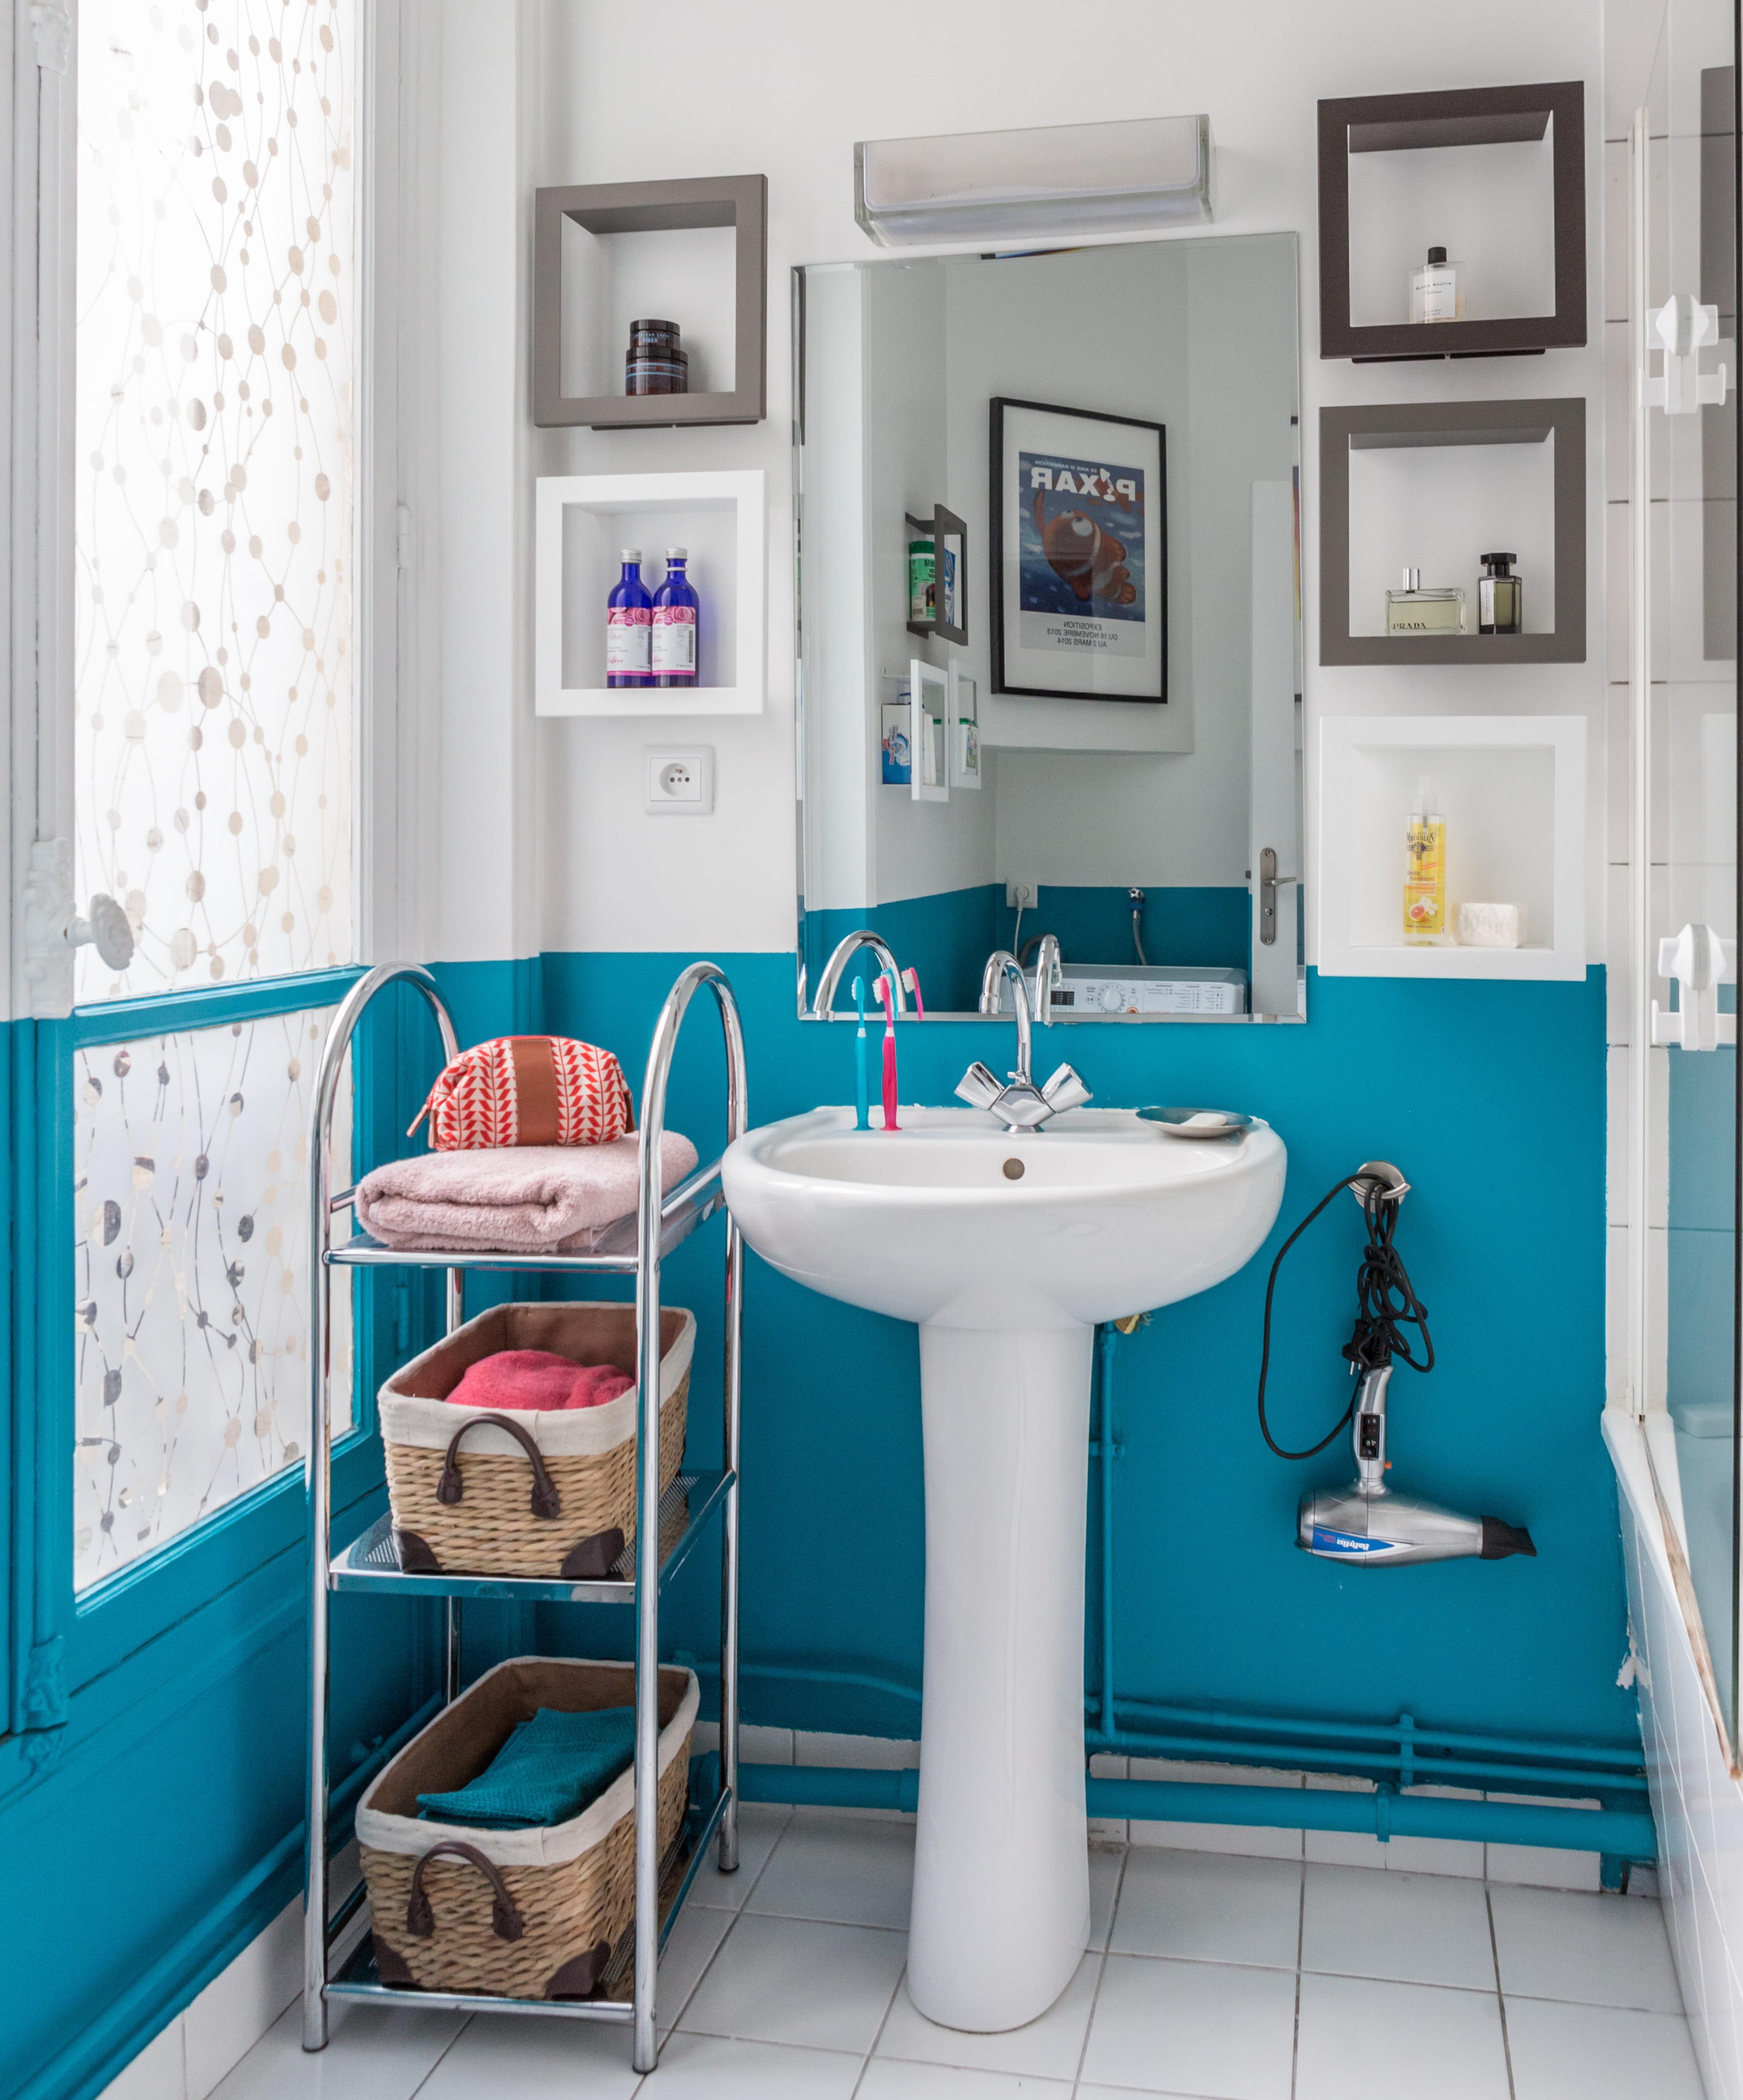 Meuble De Salle De Bain Osier 10 trucs pour relooker sa salle de bains sans se ruiner